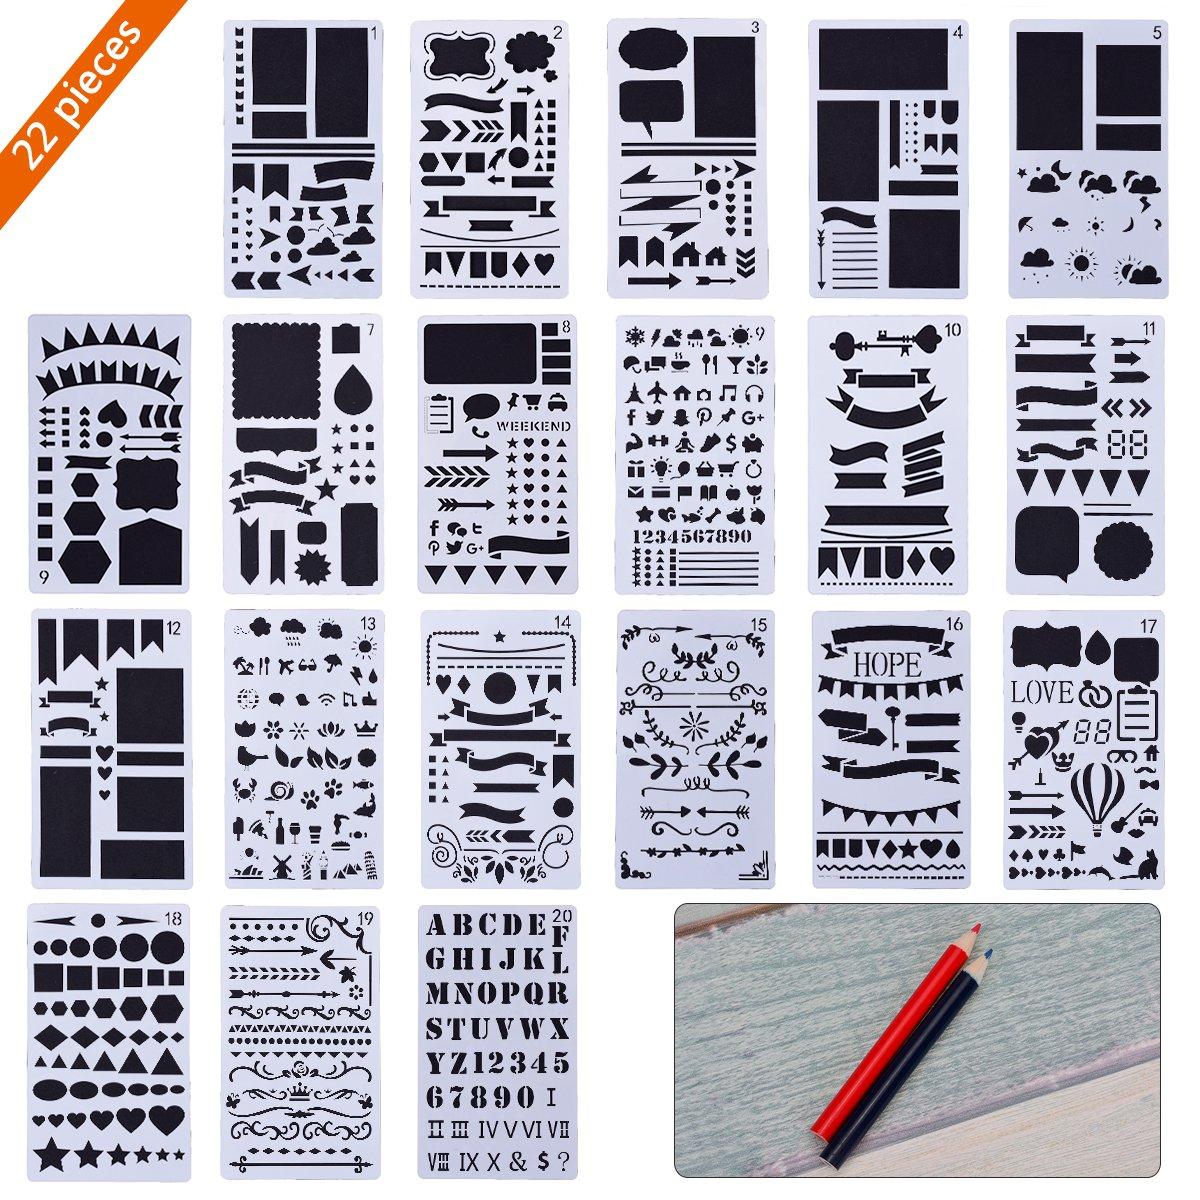 Stencil Bullet Journal TankerStreet 20 Pezzi Stencil di Diario in Plastica Planner con Matite Rosse Blu Template Stencil da Disegno per Notebook Creativo Scrapbook Fai Da Te 4x7 Pollici